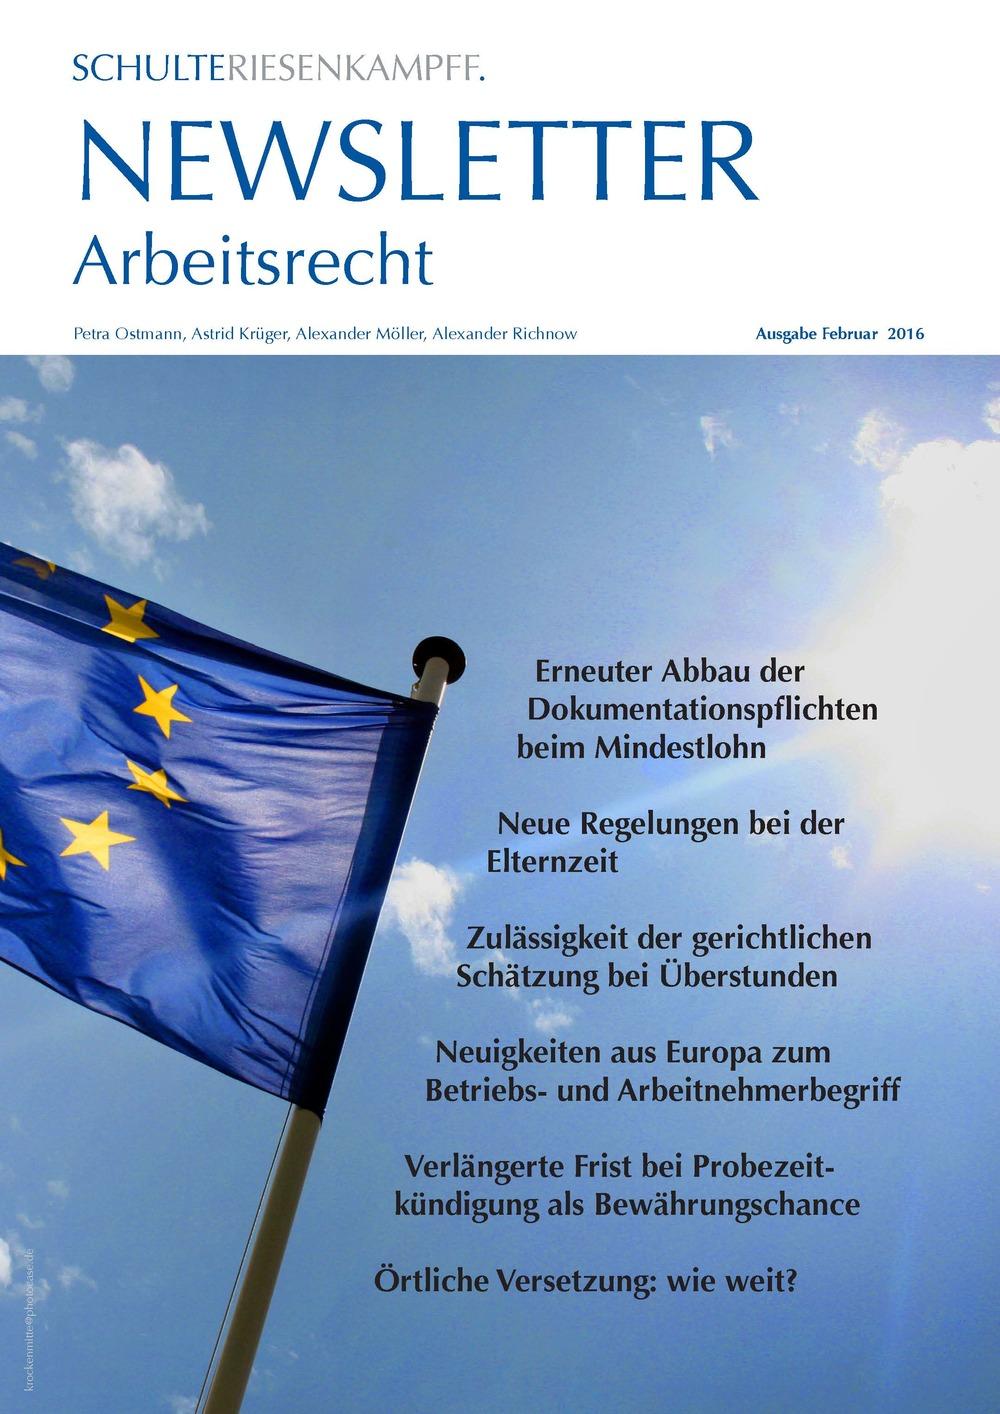 NL AR Dt. 2-16 Titelseite.jpg